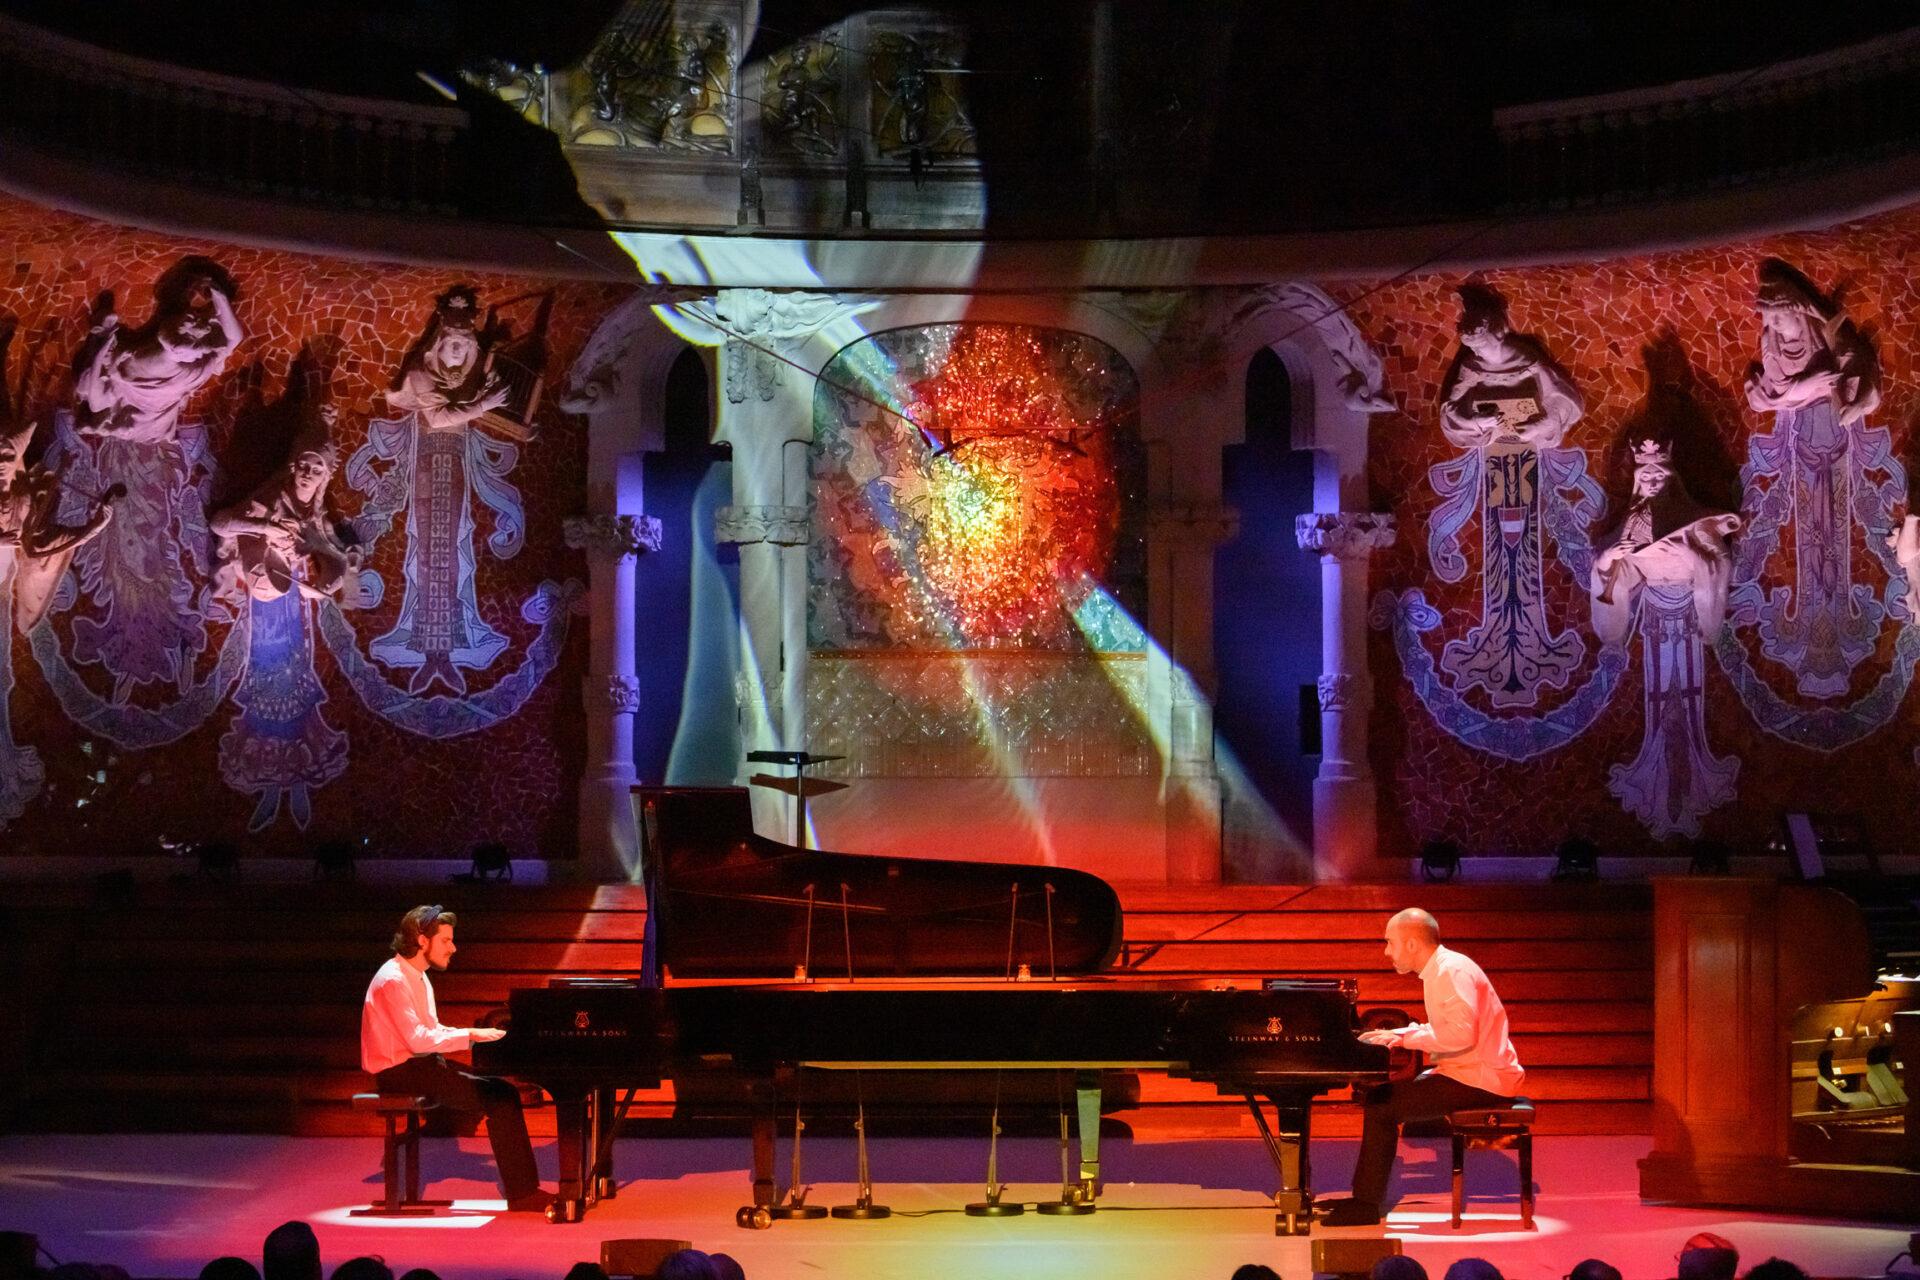 ECHO-Palau de Musica - A. Bofill